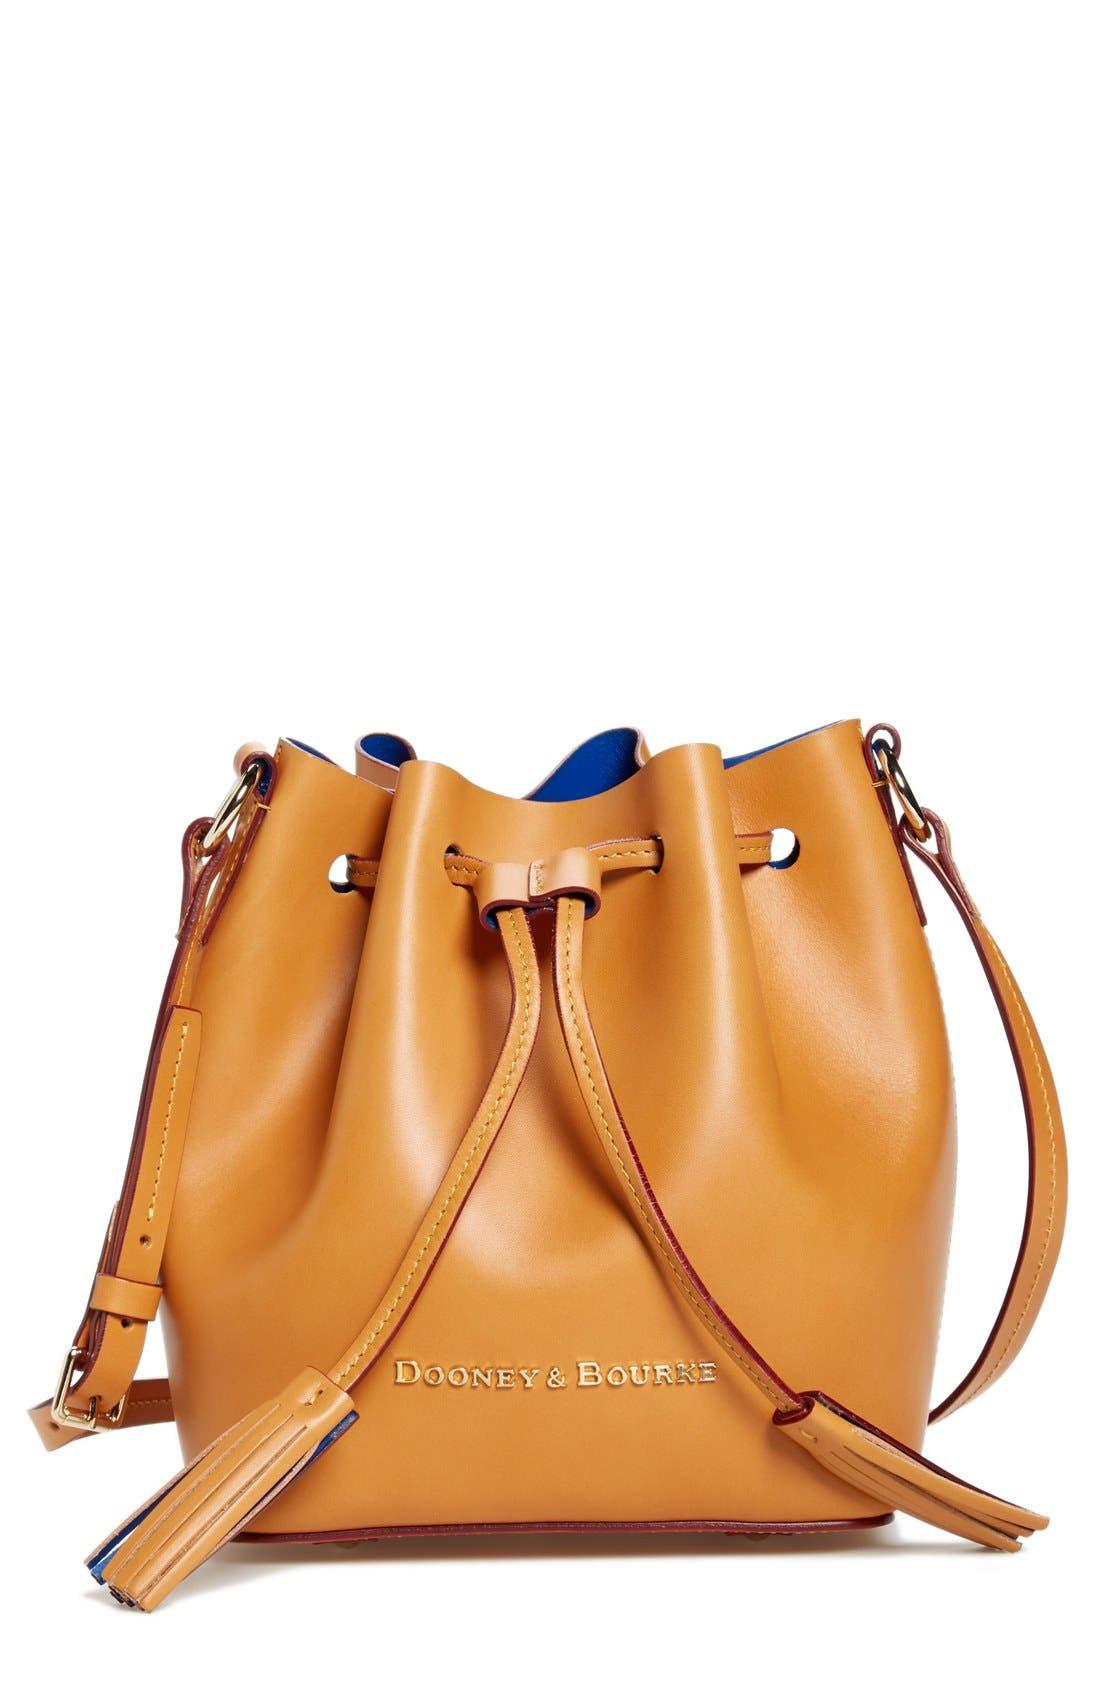 Alternate Image 1 Selected - Dooney & Bourke 'Serena' Leather Bucket Bag